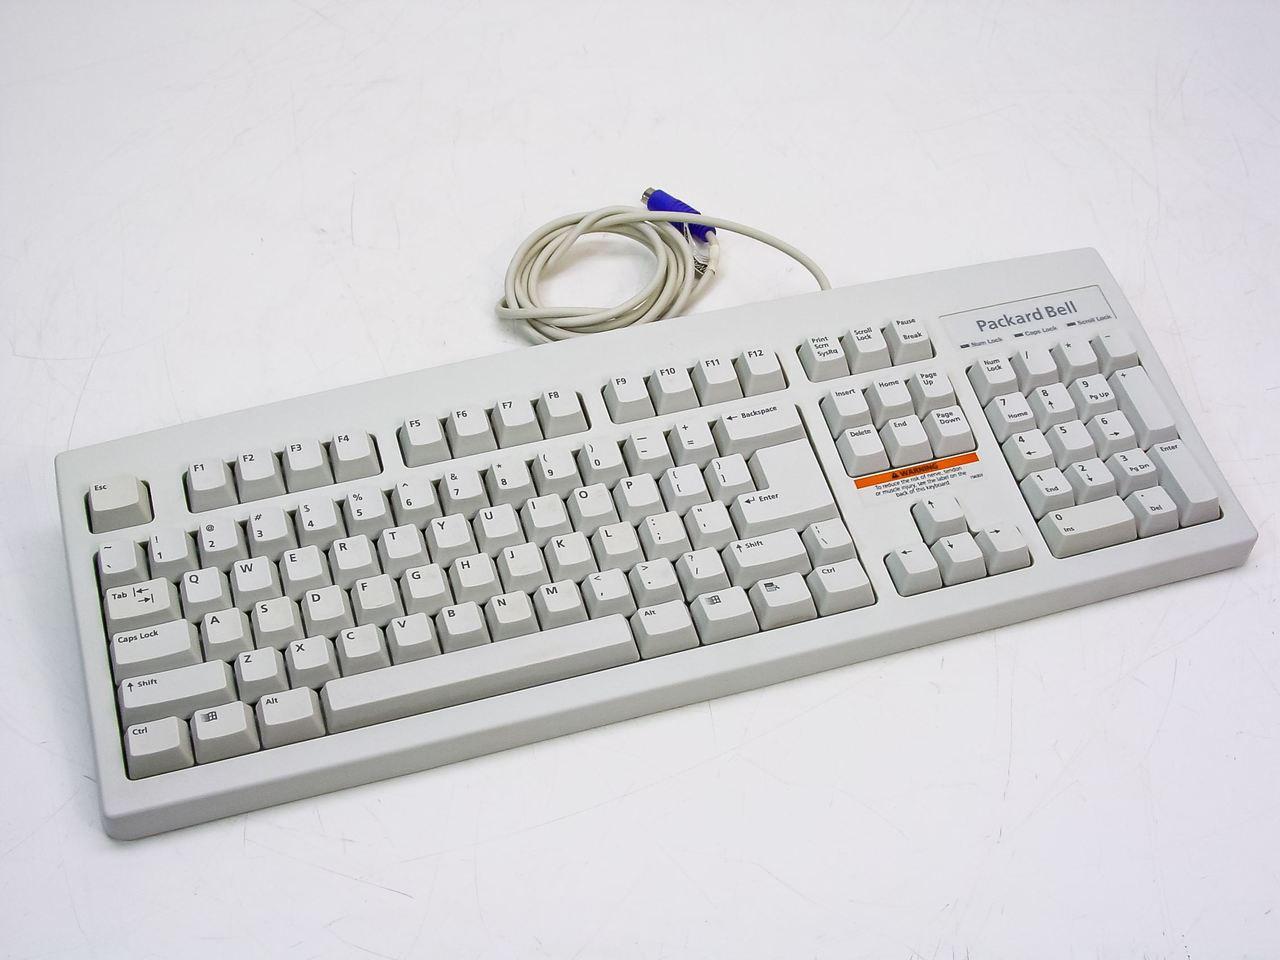 Packard Bell Keyboard German KB.PS20B.067